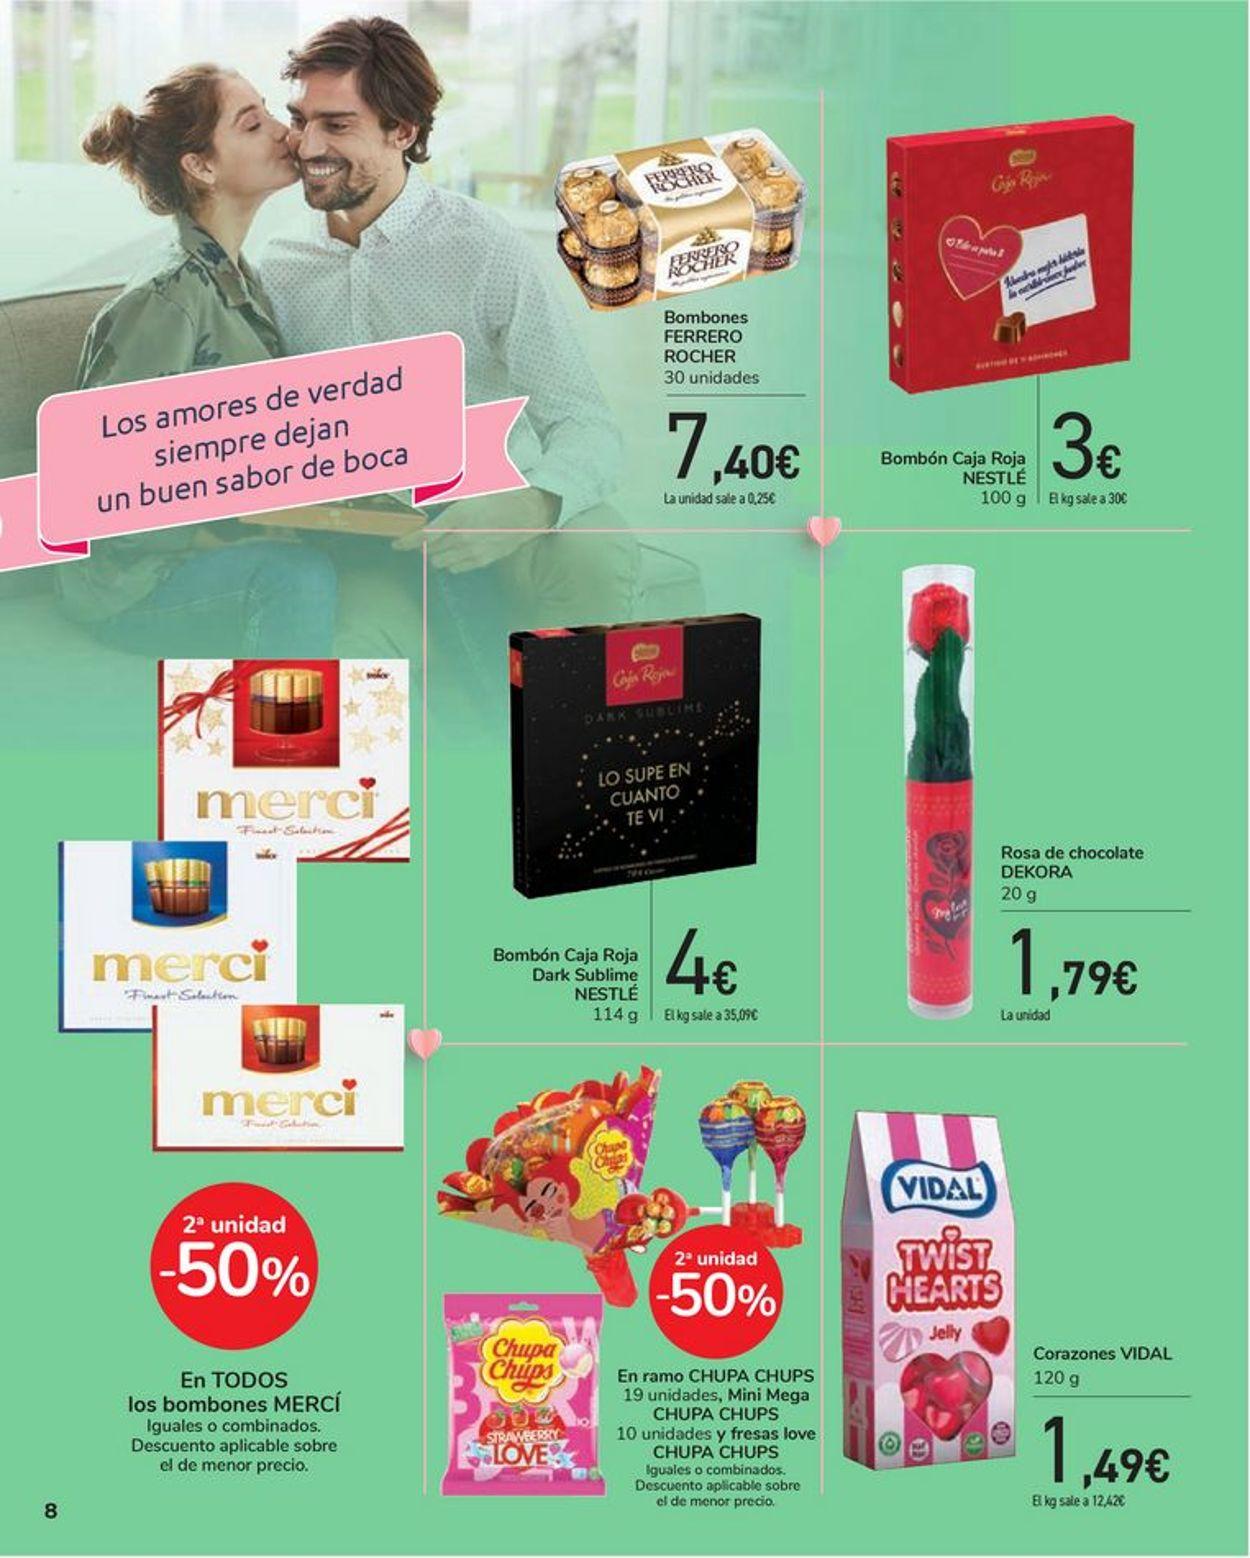 Carrefour Folleto - 02.02-14.02.2021 (Página 8)